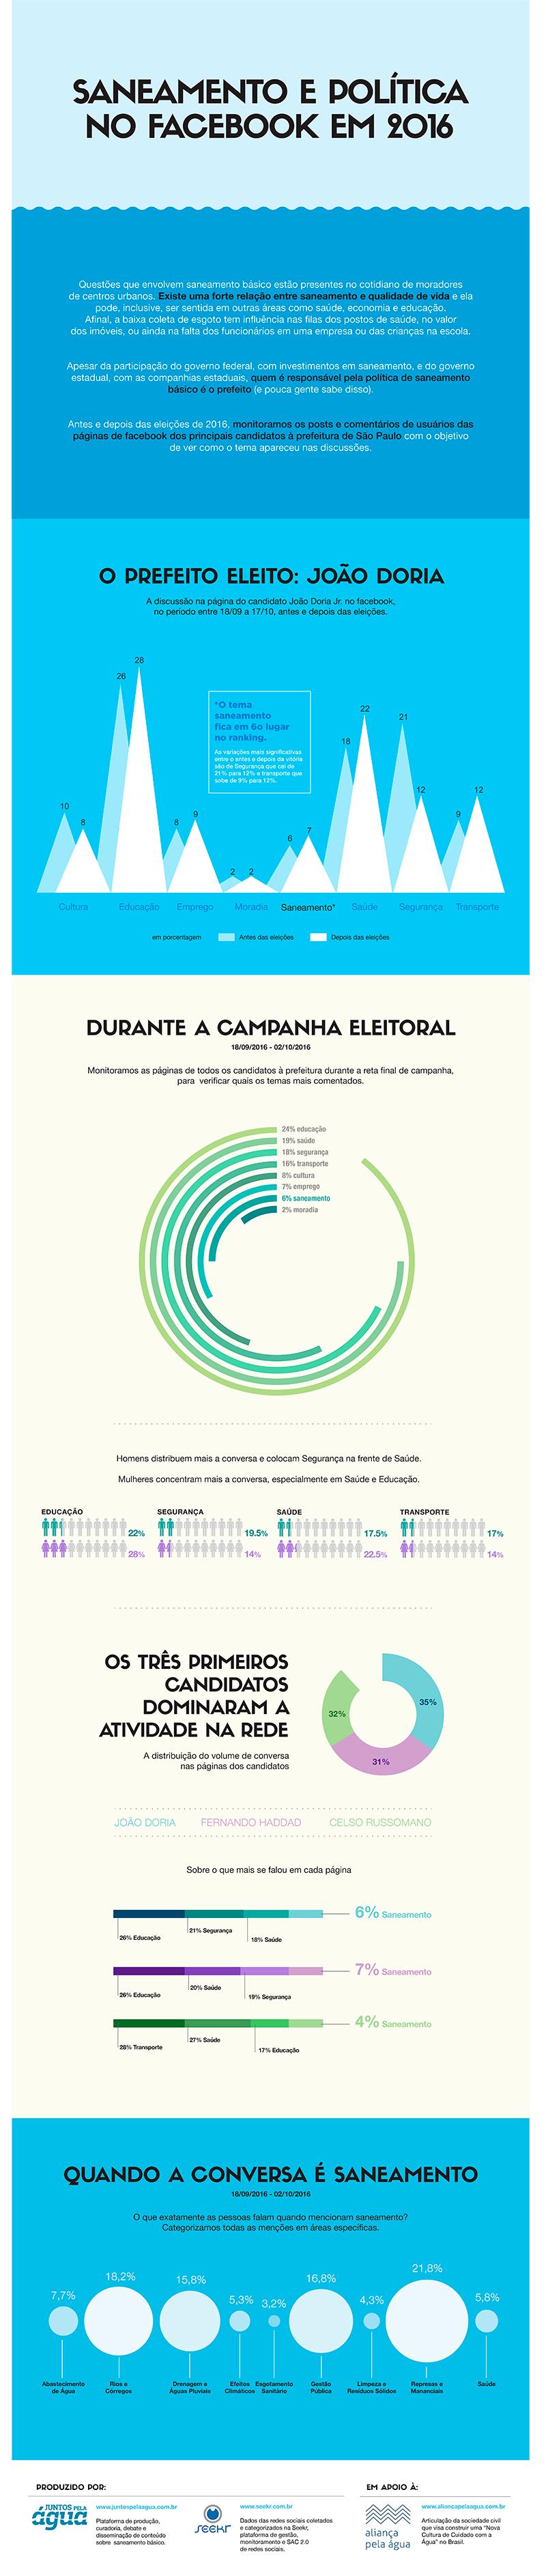 infografico1 (1)